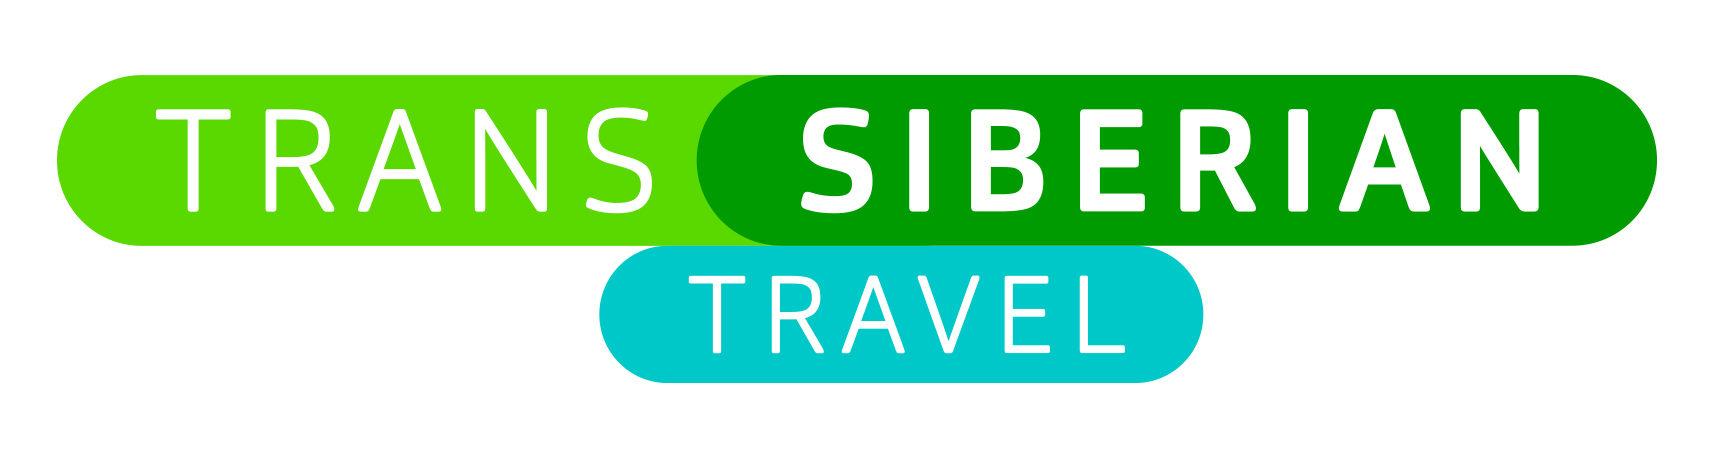 Trans Siberian Travel